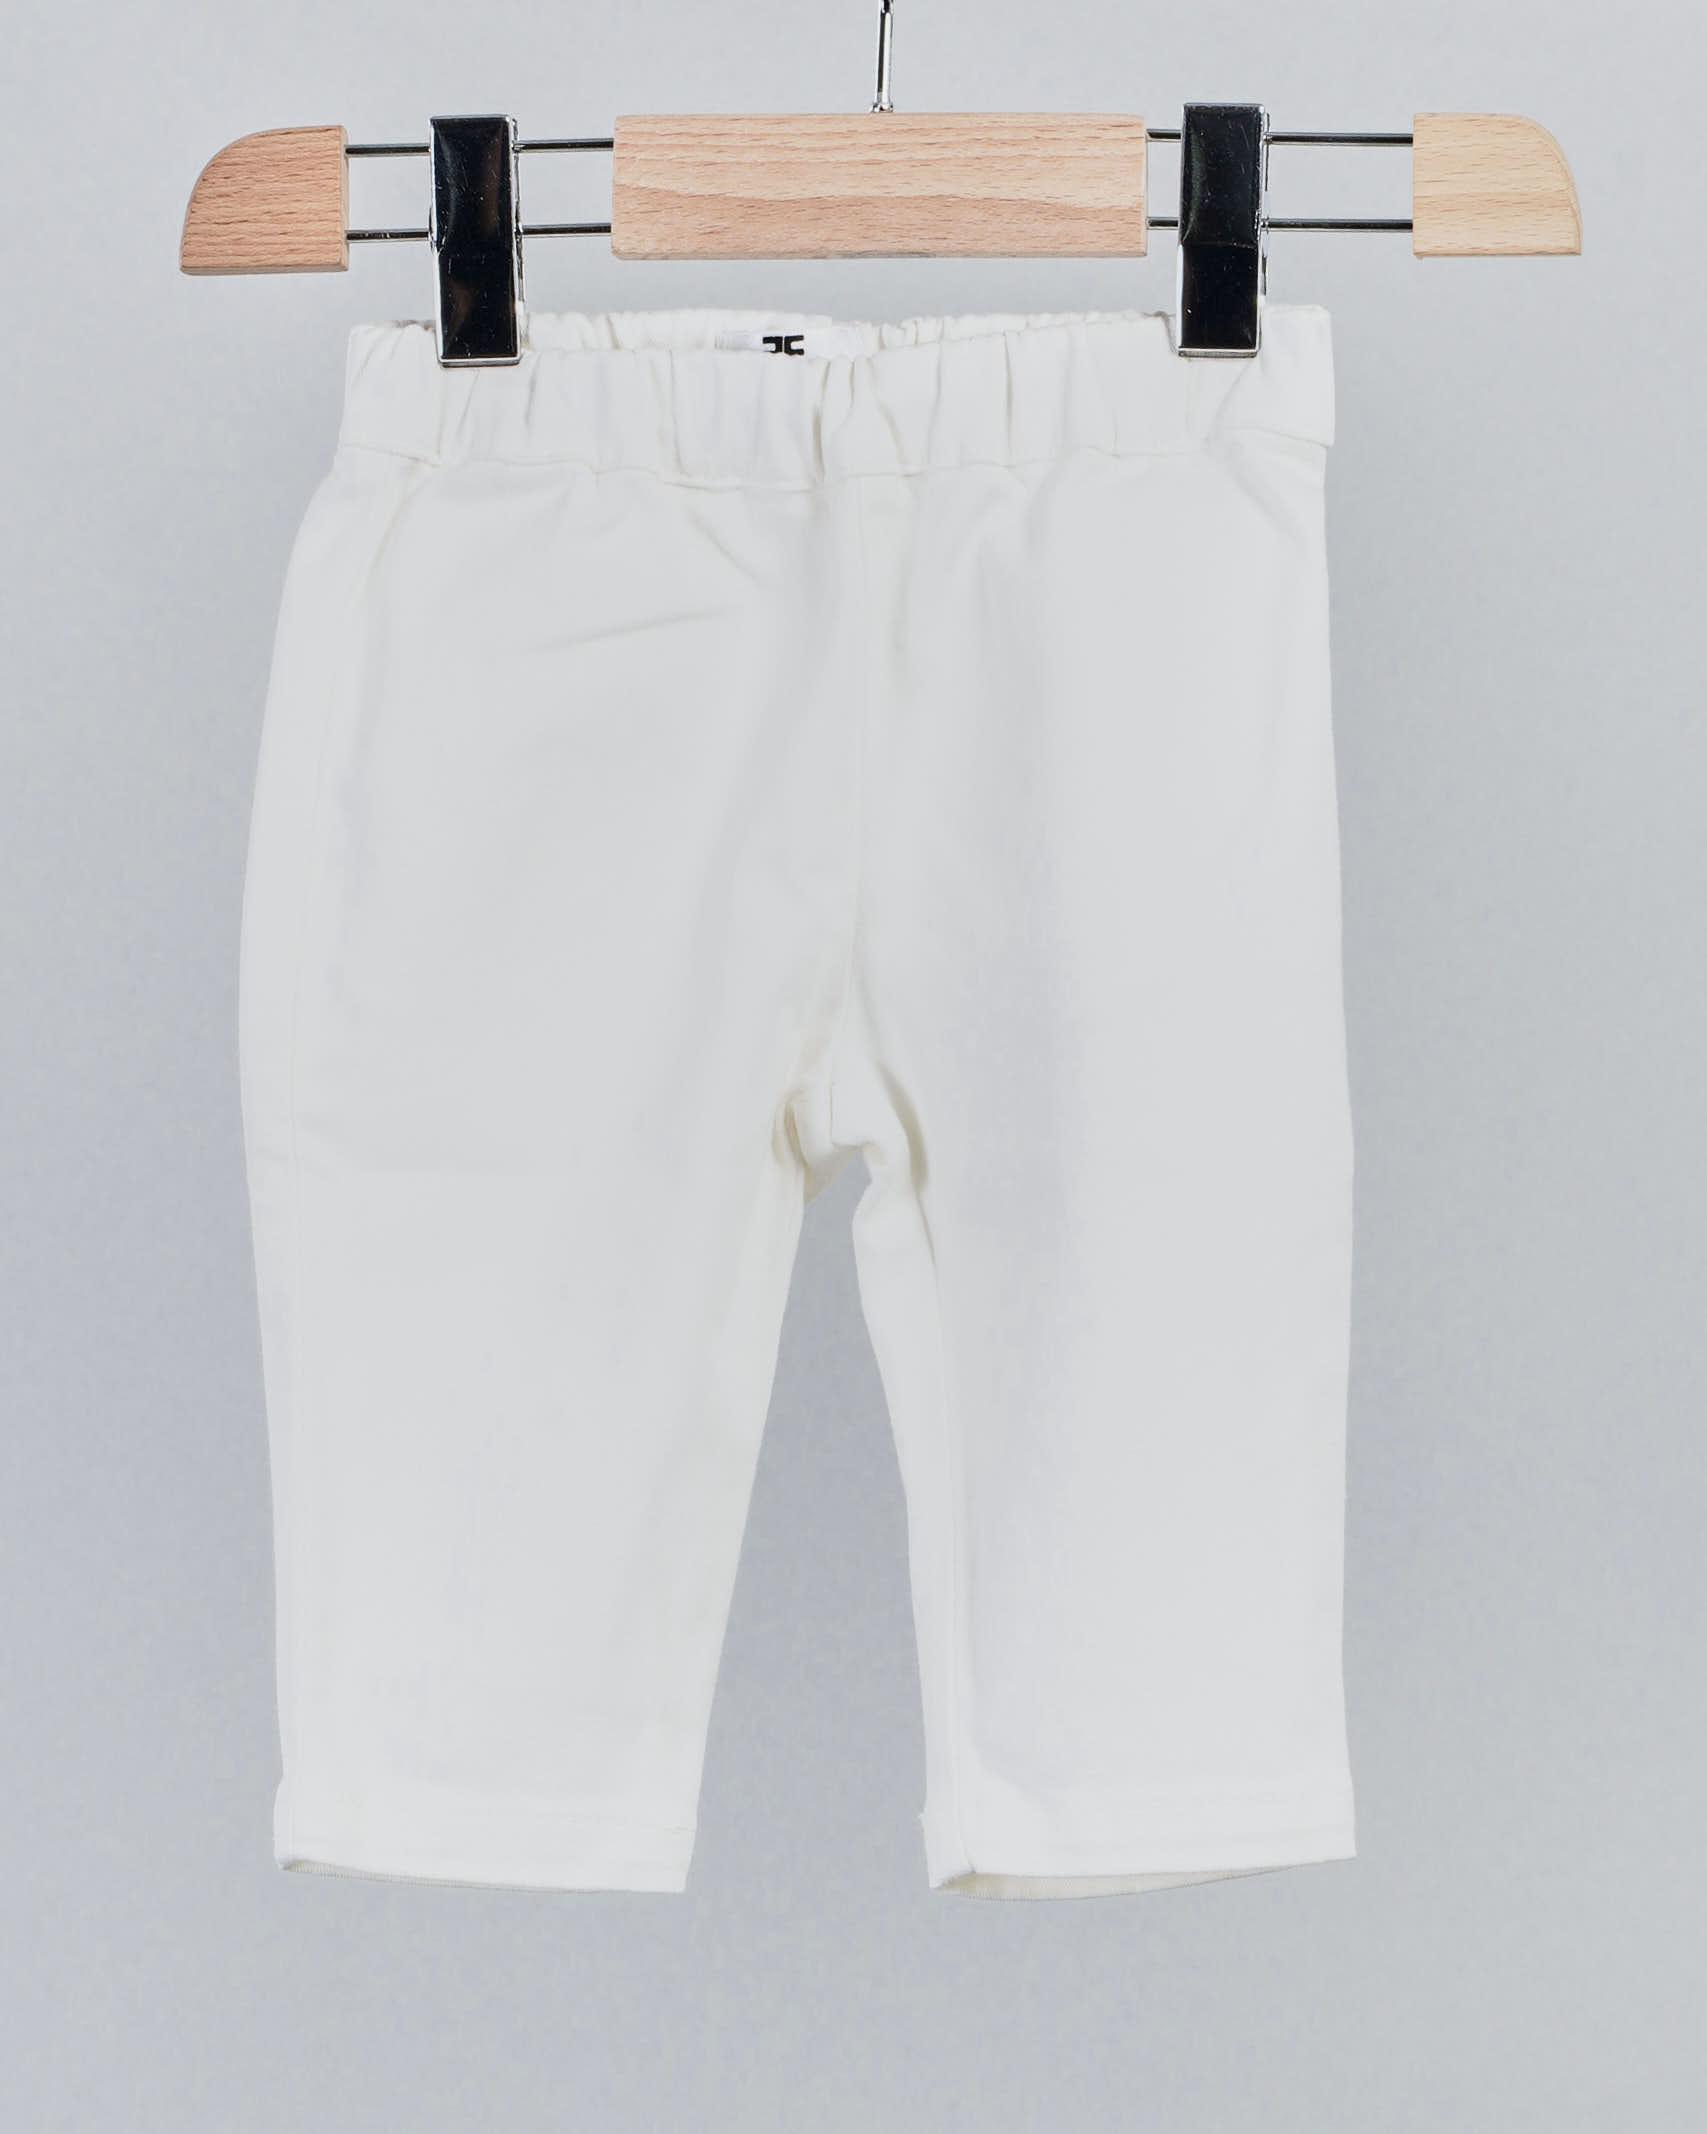 Pantalone con logo e frange Elisabetta Franchi La Mia Bambina ELISABETTA FRANCHI LA MIA BAMBINA | Pantalone | EGPA27CE197WE01412